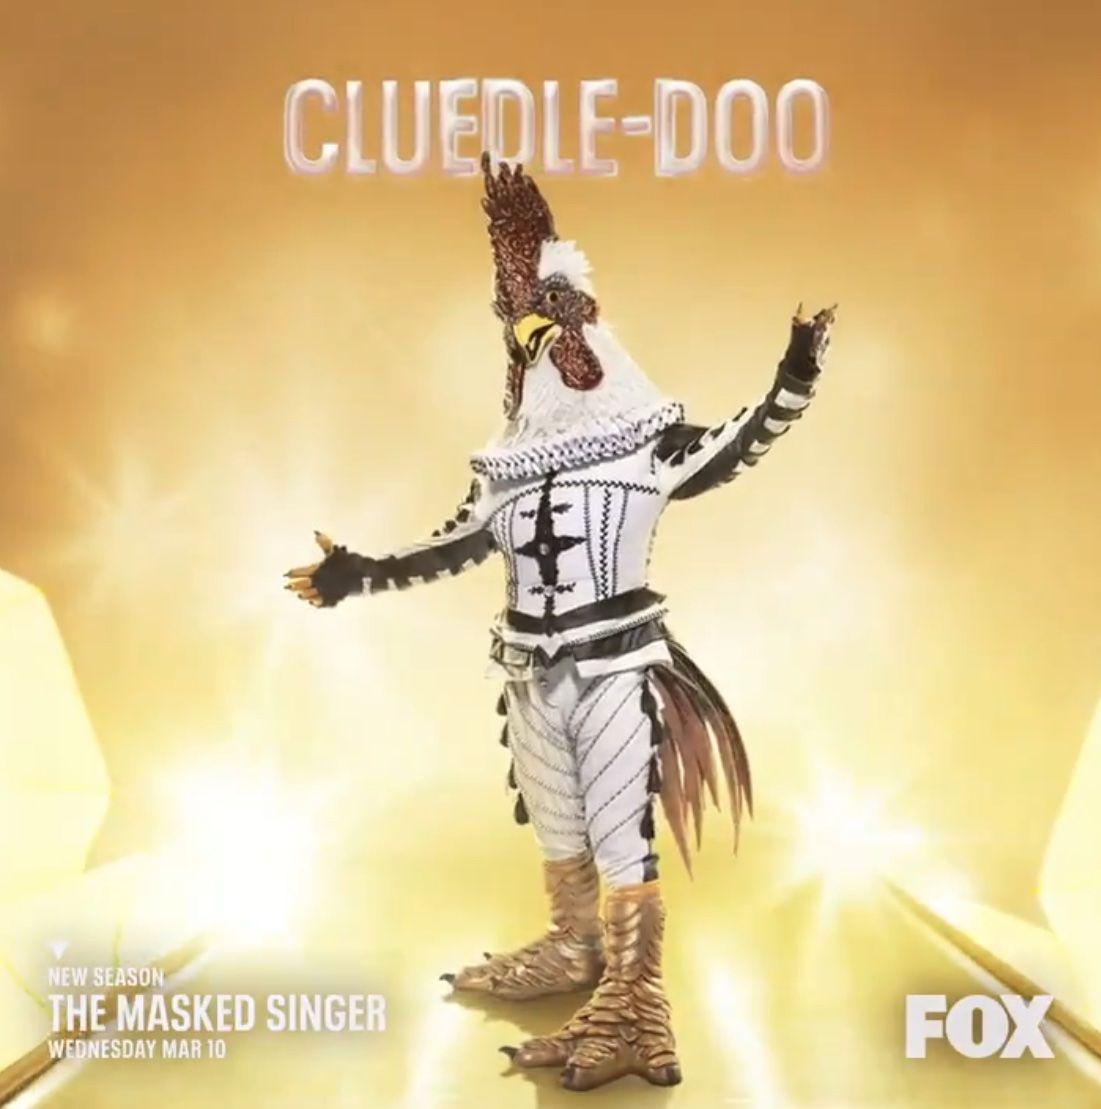 the-masked-singer-cluedle-doo-1614728778